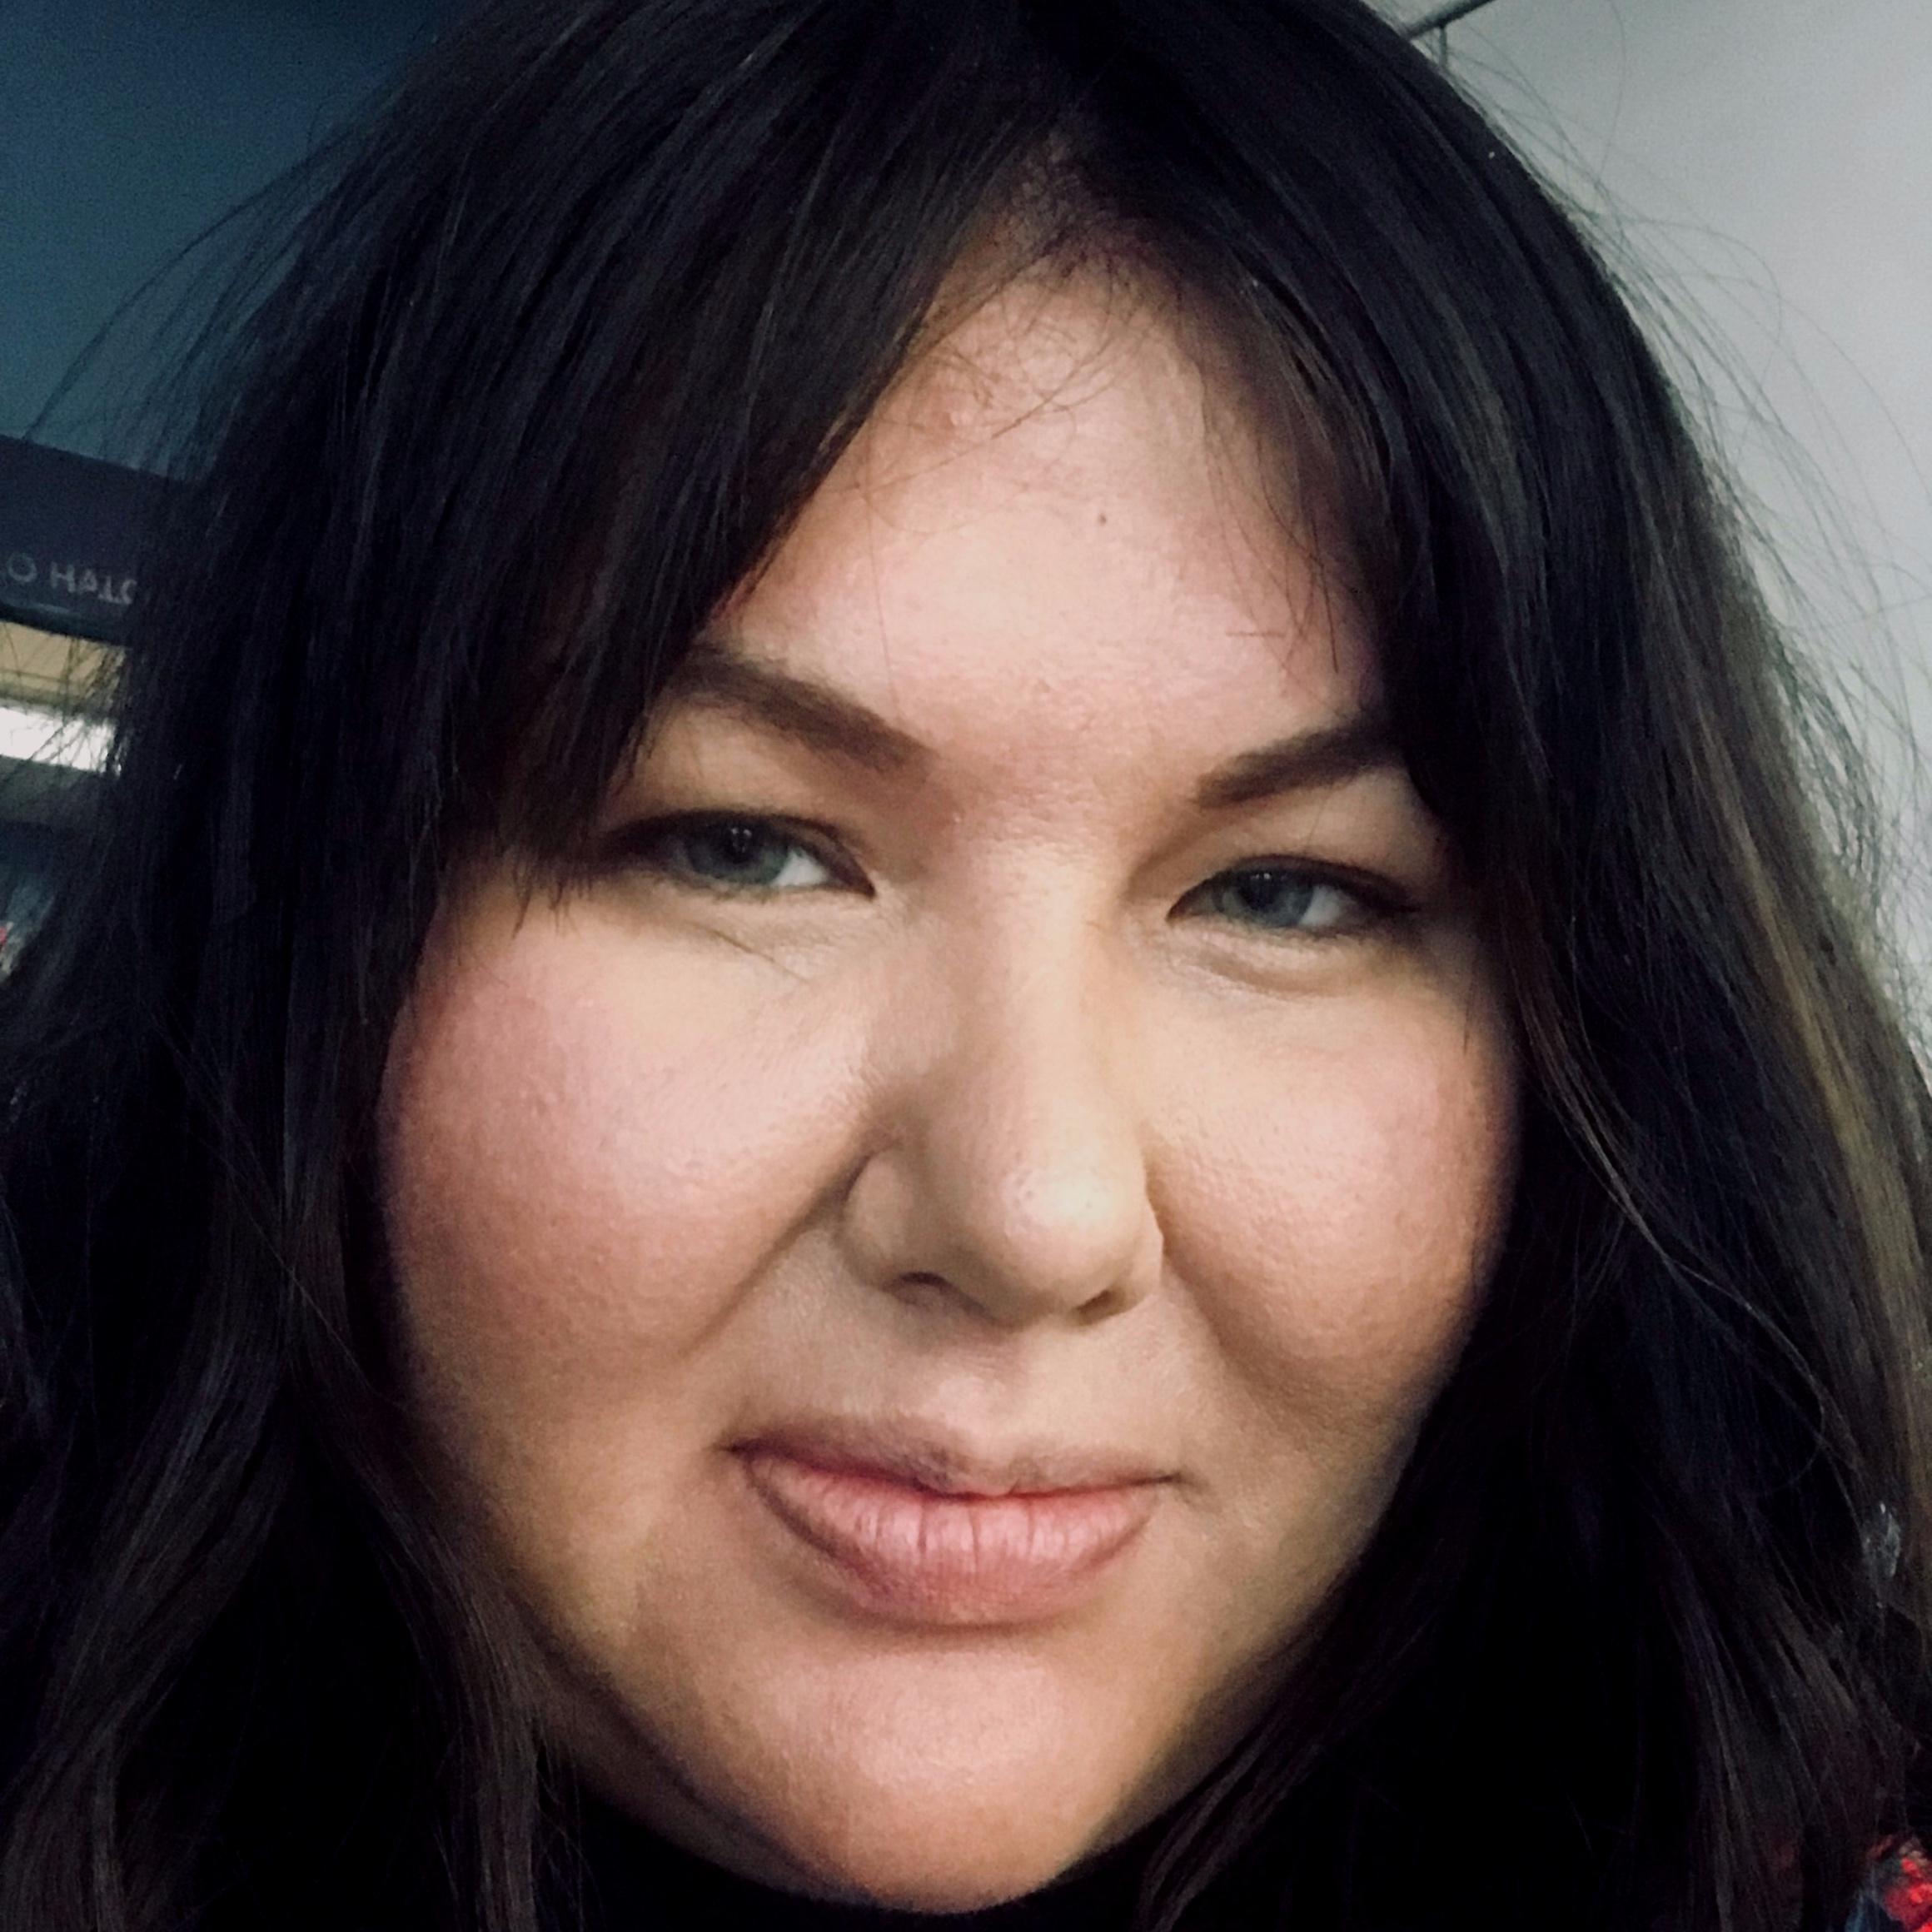 Michelle O'Grady - Entrepreneur + Creative StrategistTeam Friday